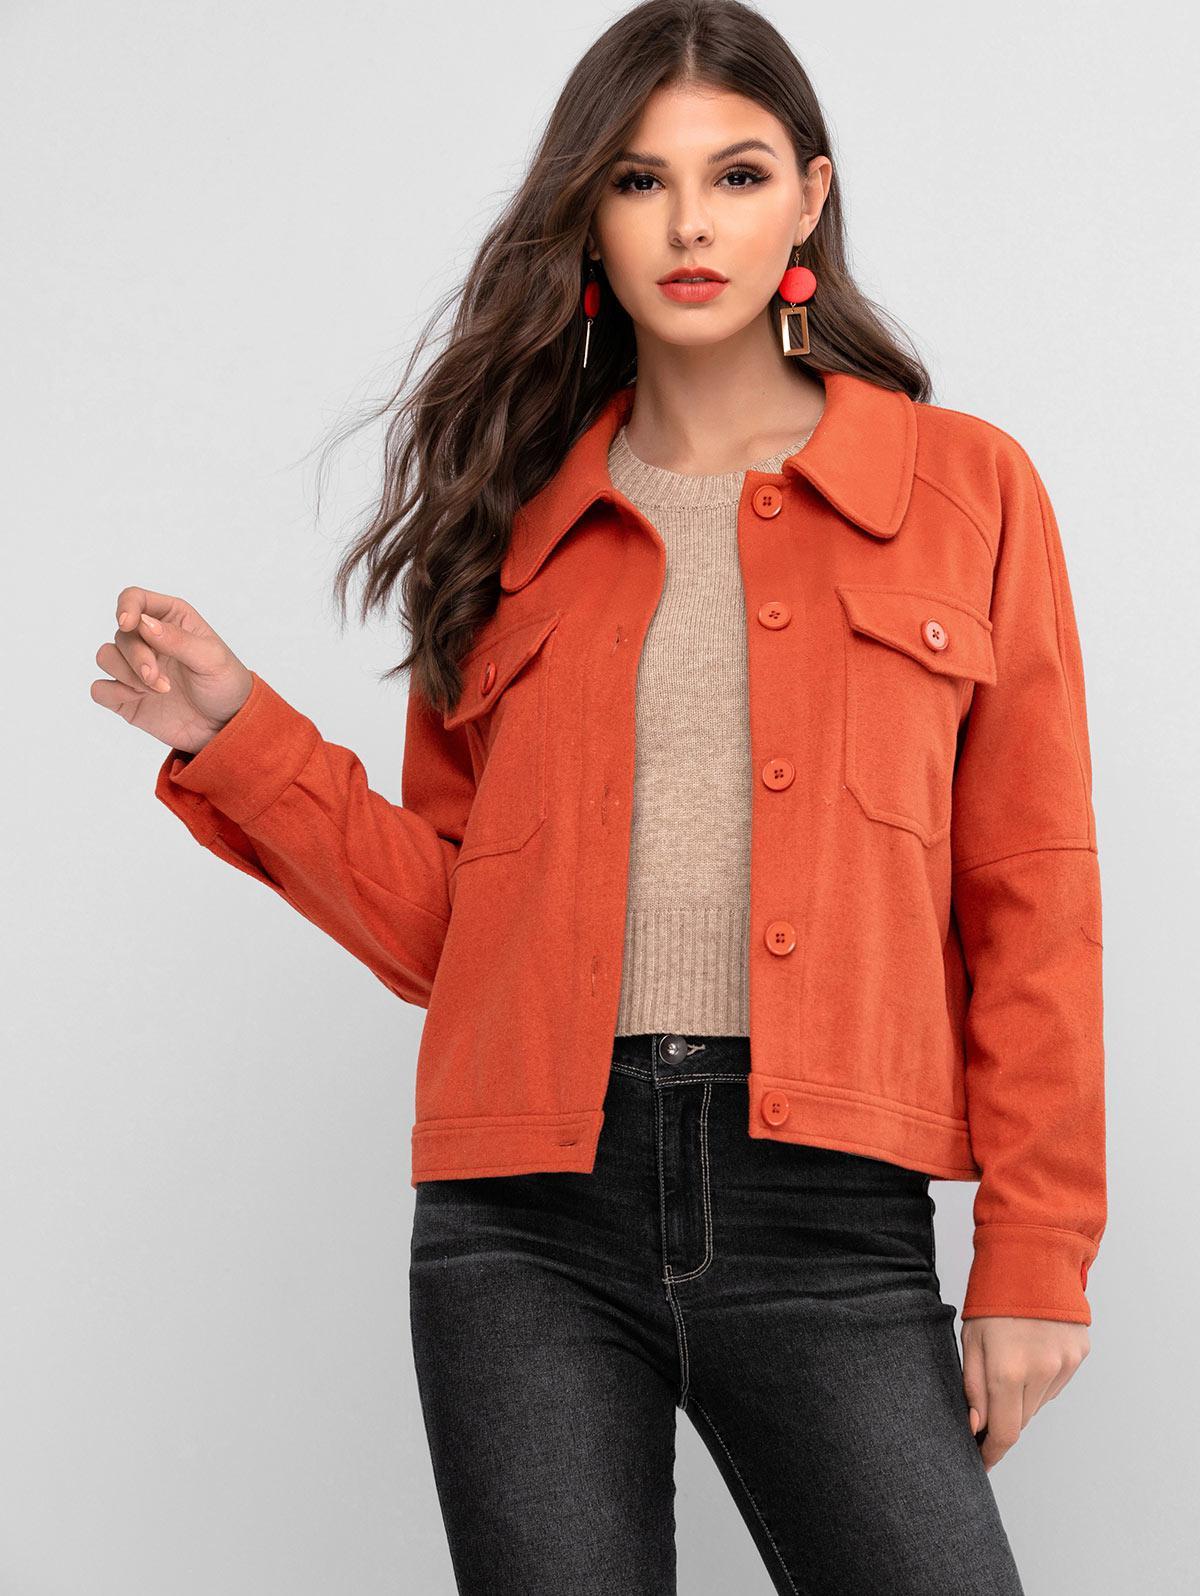 ZAFUL Raglan Sleeve Pocket Button Up Coat